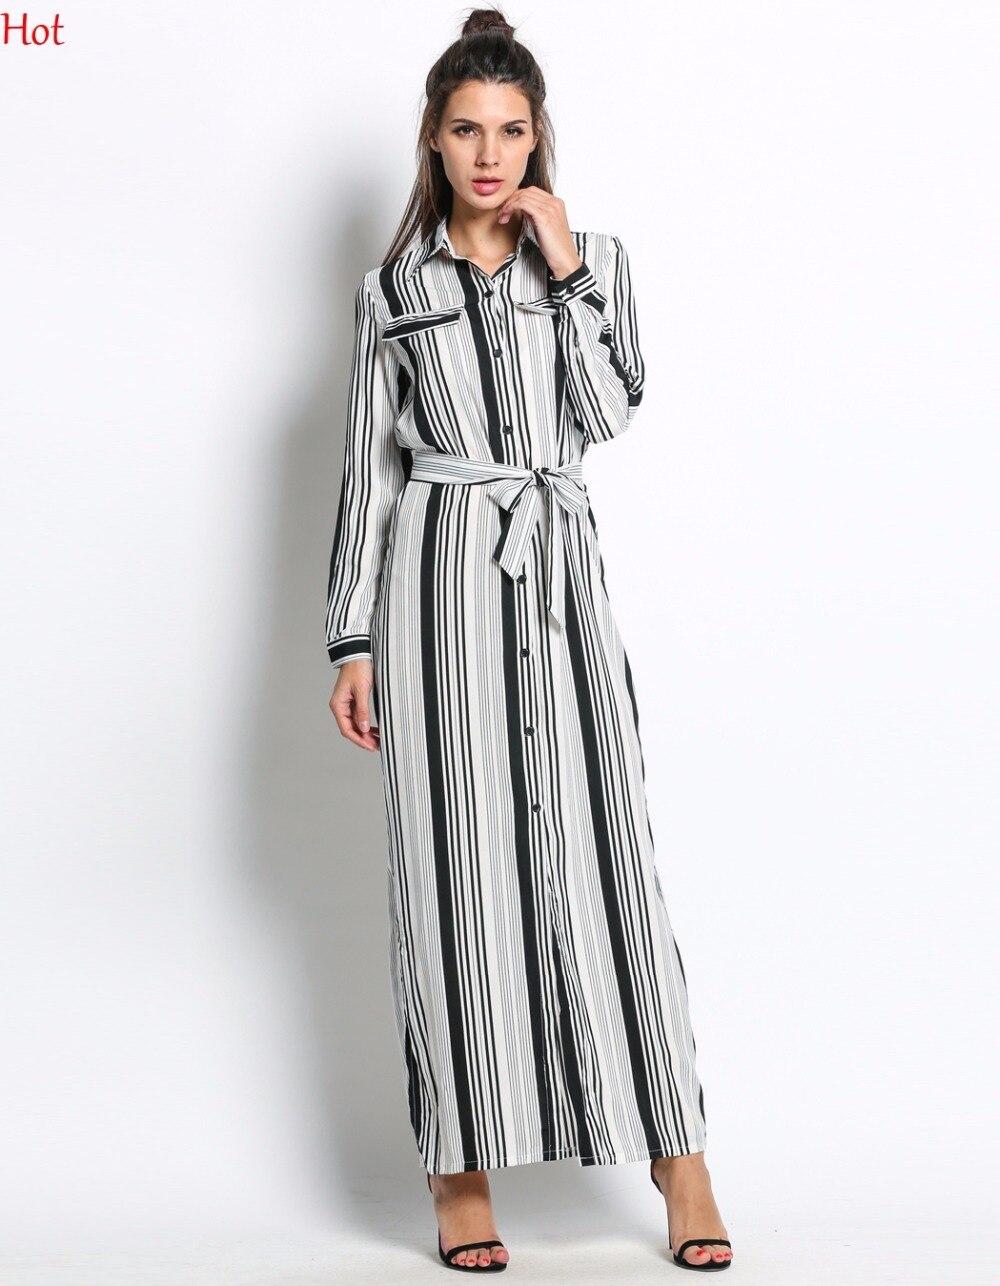 Us 939 Hot Black White Striped Maxi Shirt Dress Long Sleeve Elegant Button Party Dresses High Split Sexy Tie Waist Tunic Dress Sv030085 In Dresses